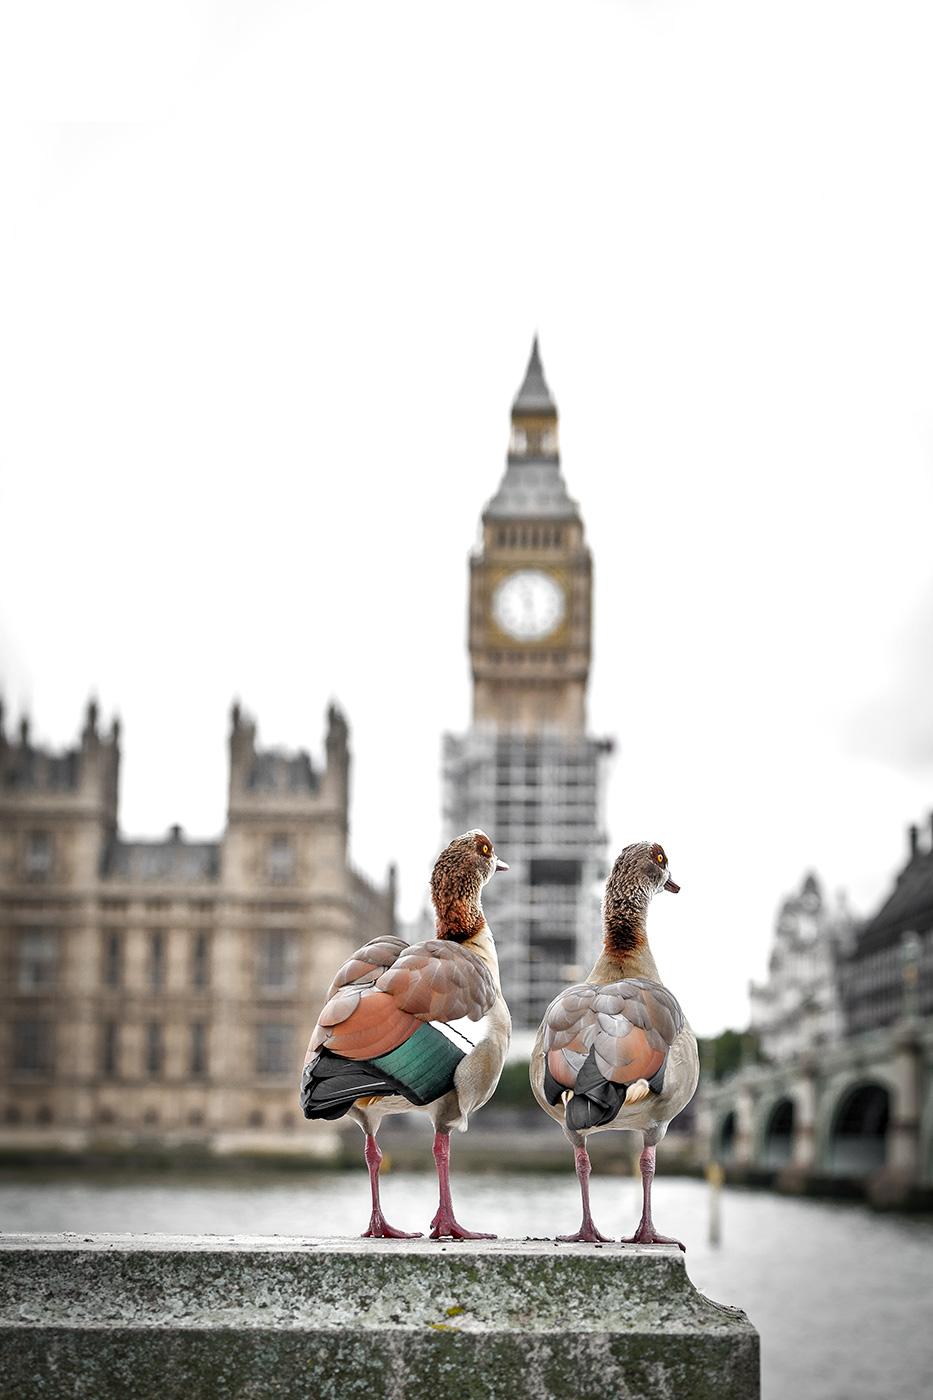 Diabetes-UK-London-Bridges-Challenge-on-1st-October-2017-©-Brendan-Foster-Photography-444-Edit-23.jpg